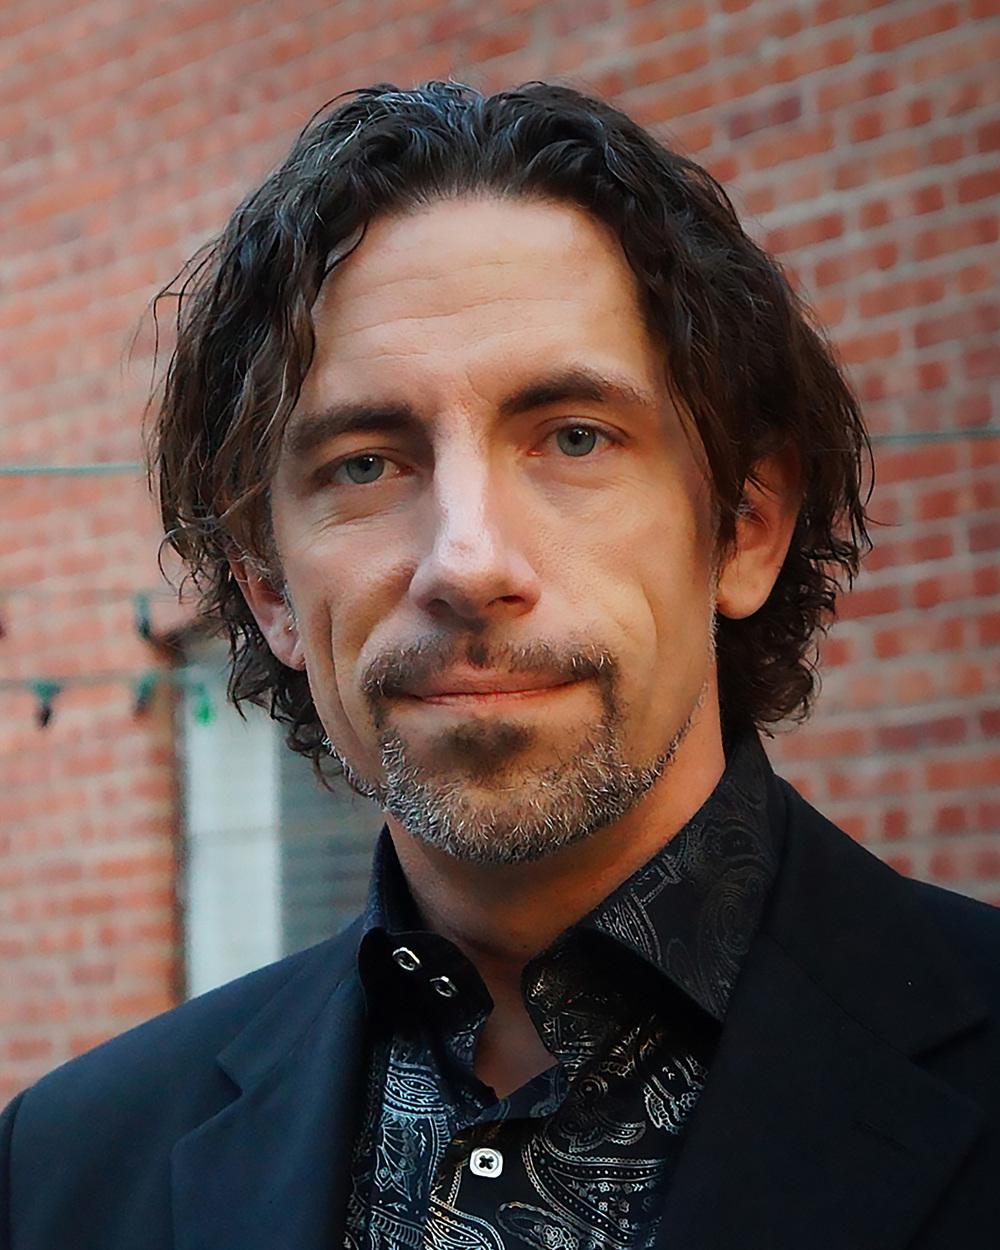 Randy Brososky